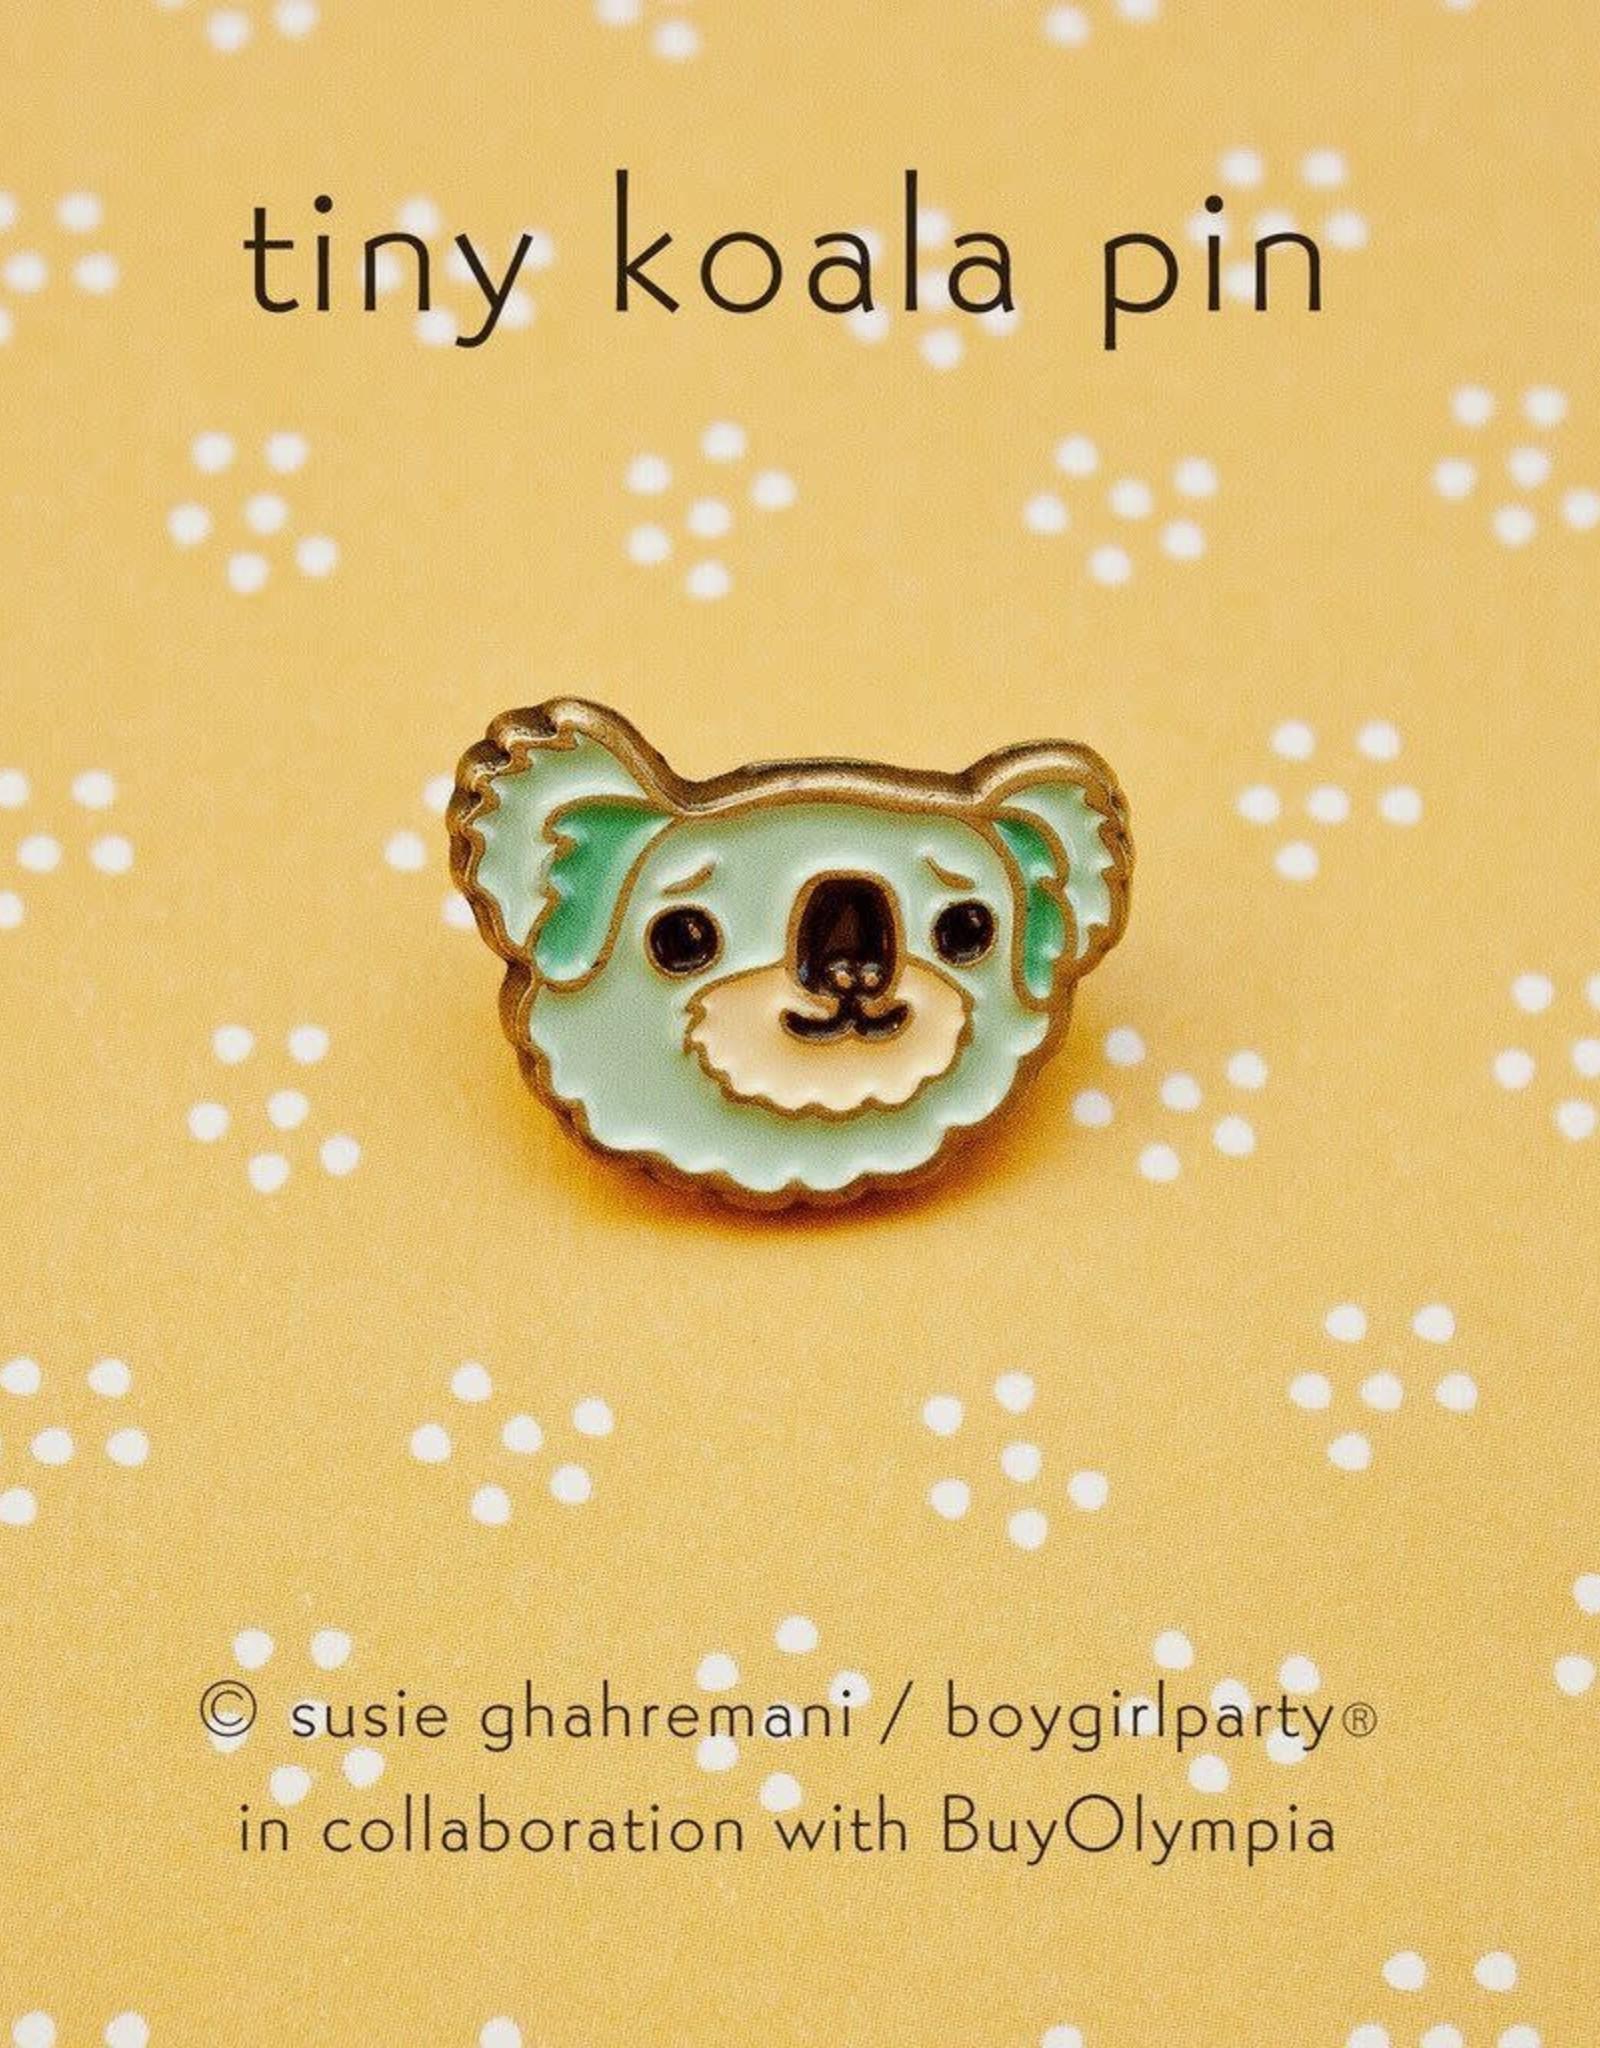 ''Blue Koala'' Enamel Pin - Susie Ghahremani